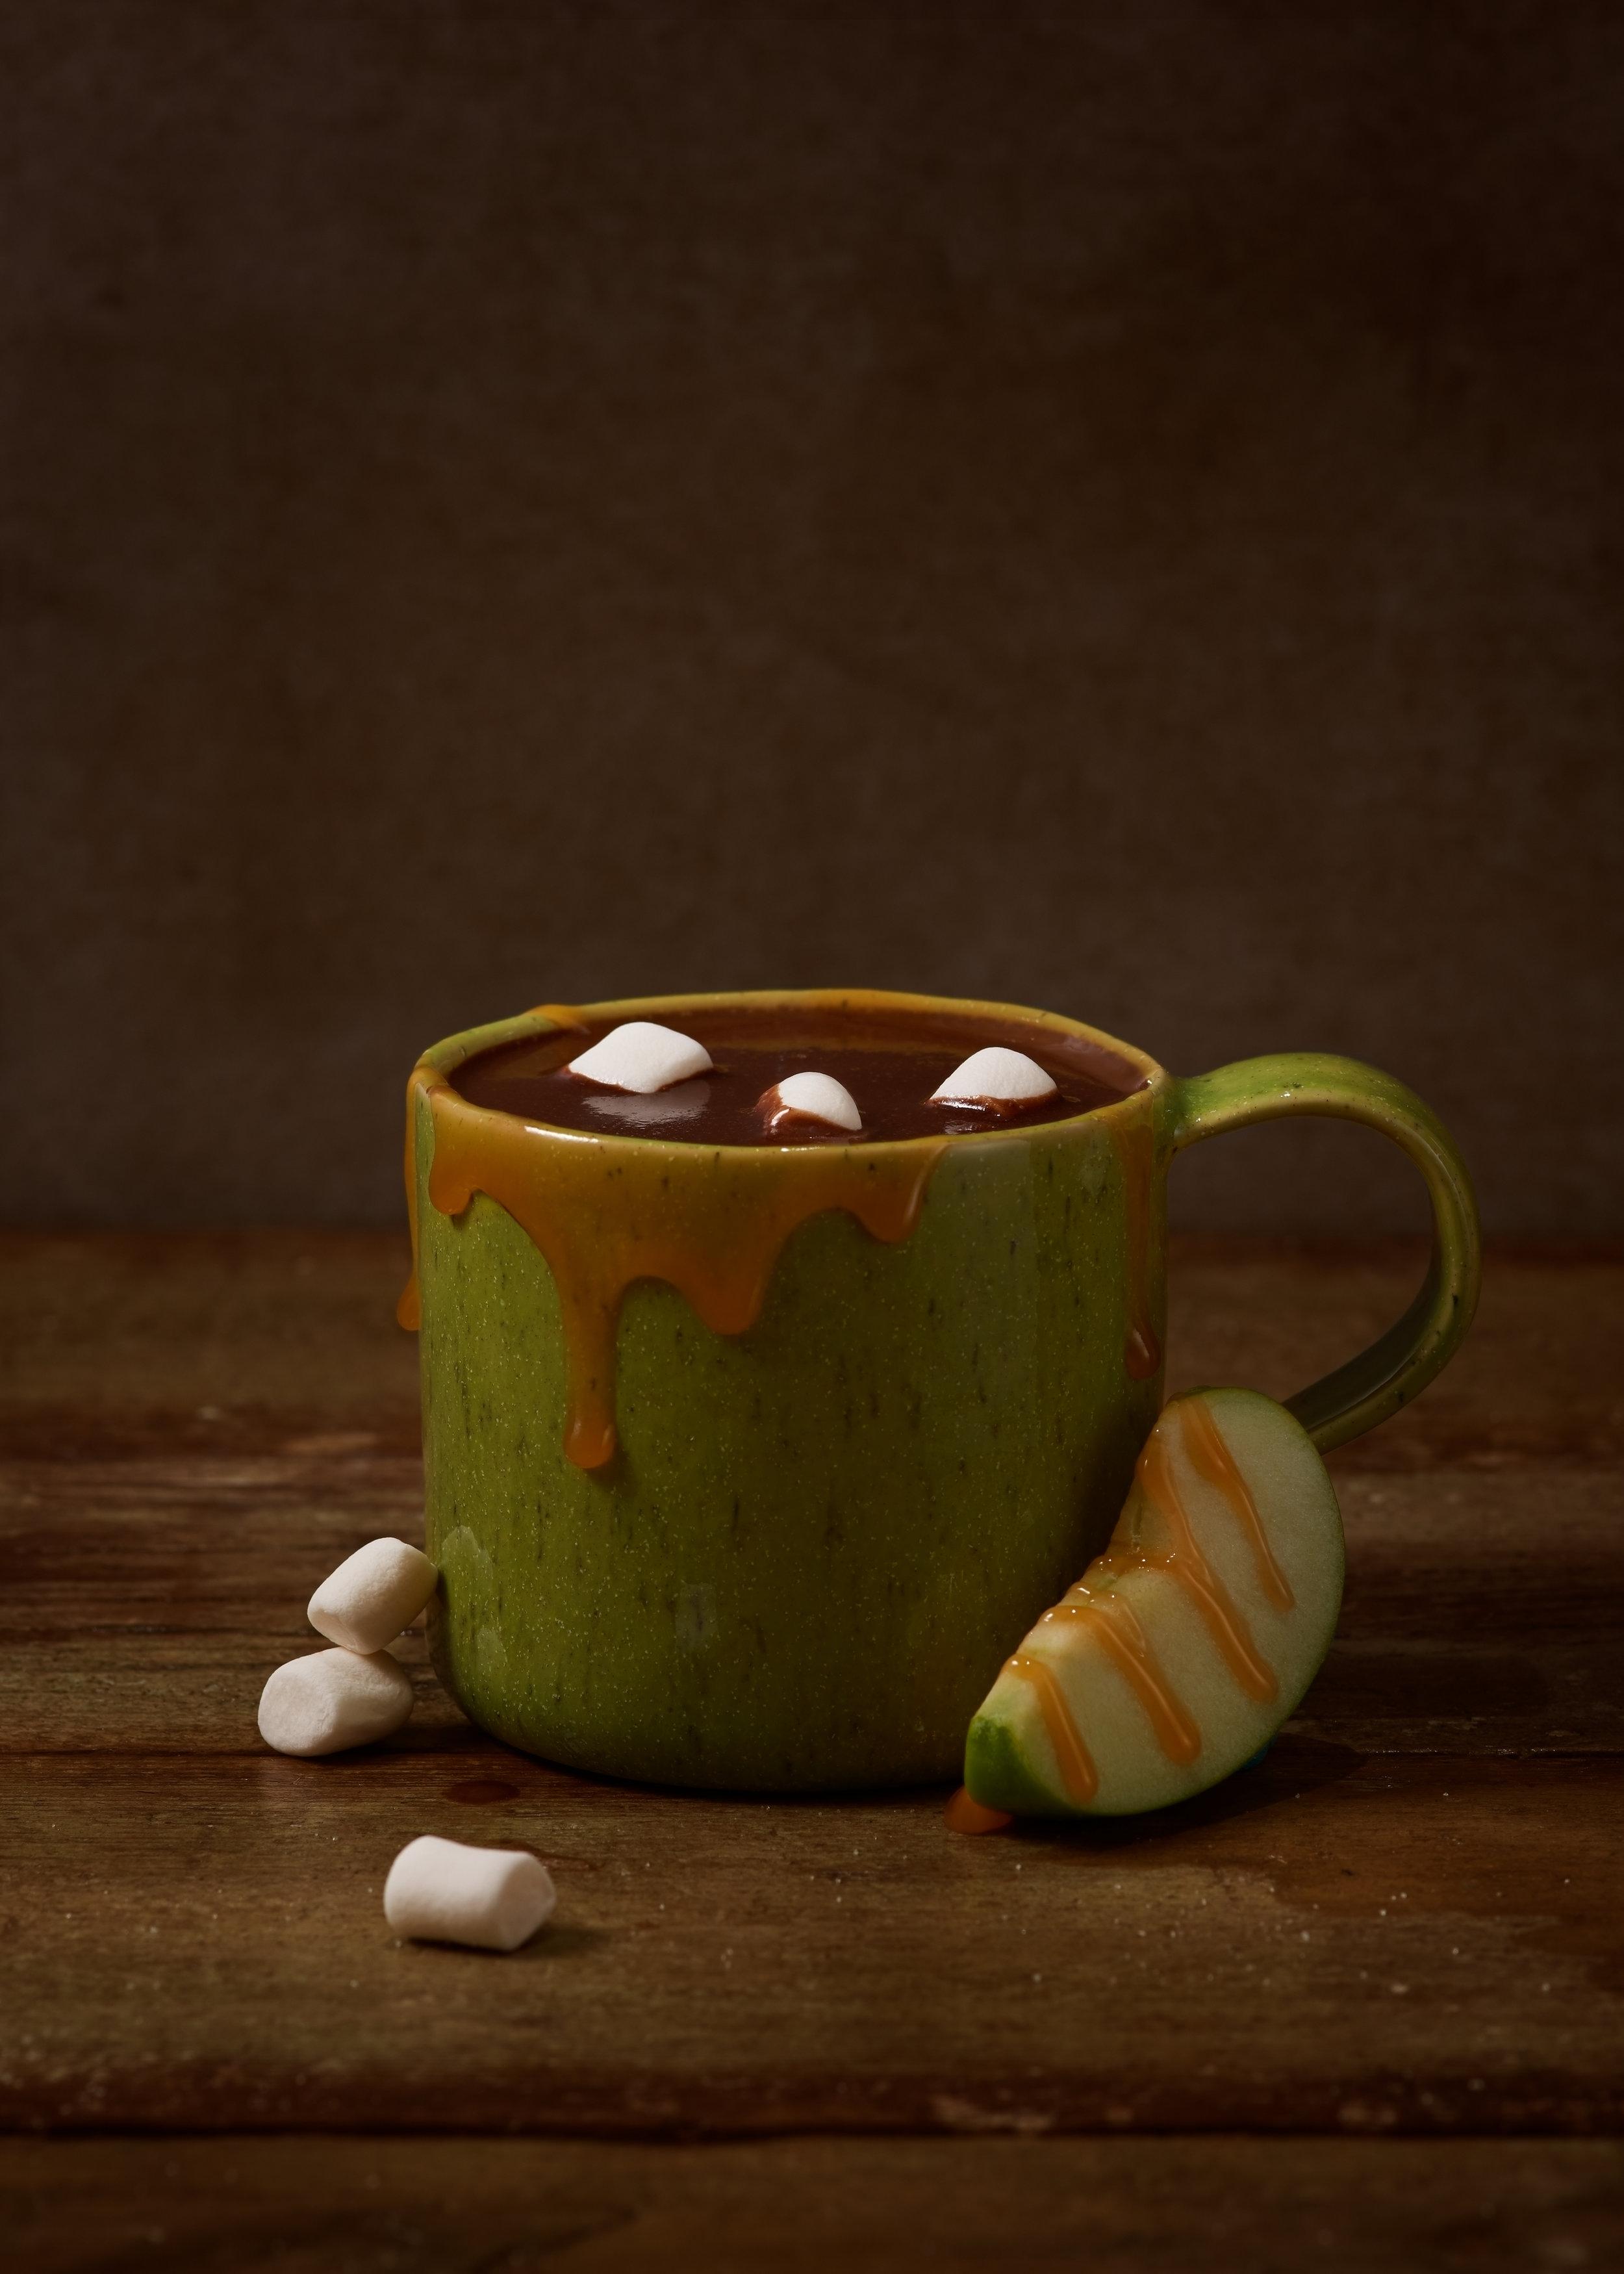 CaramelChocolate13.jpg